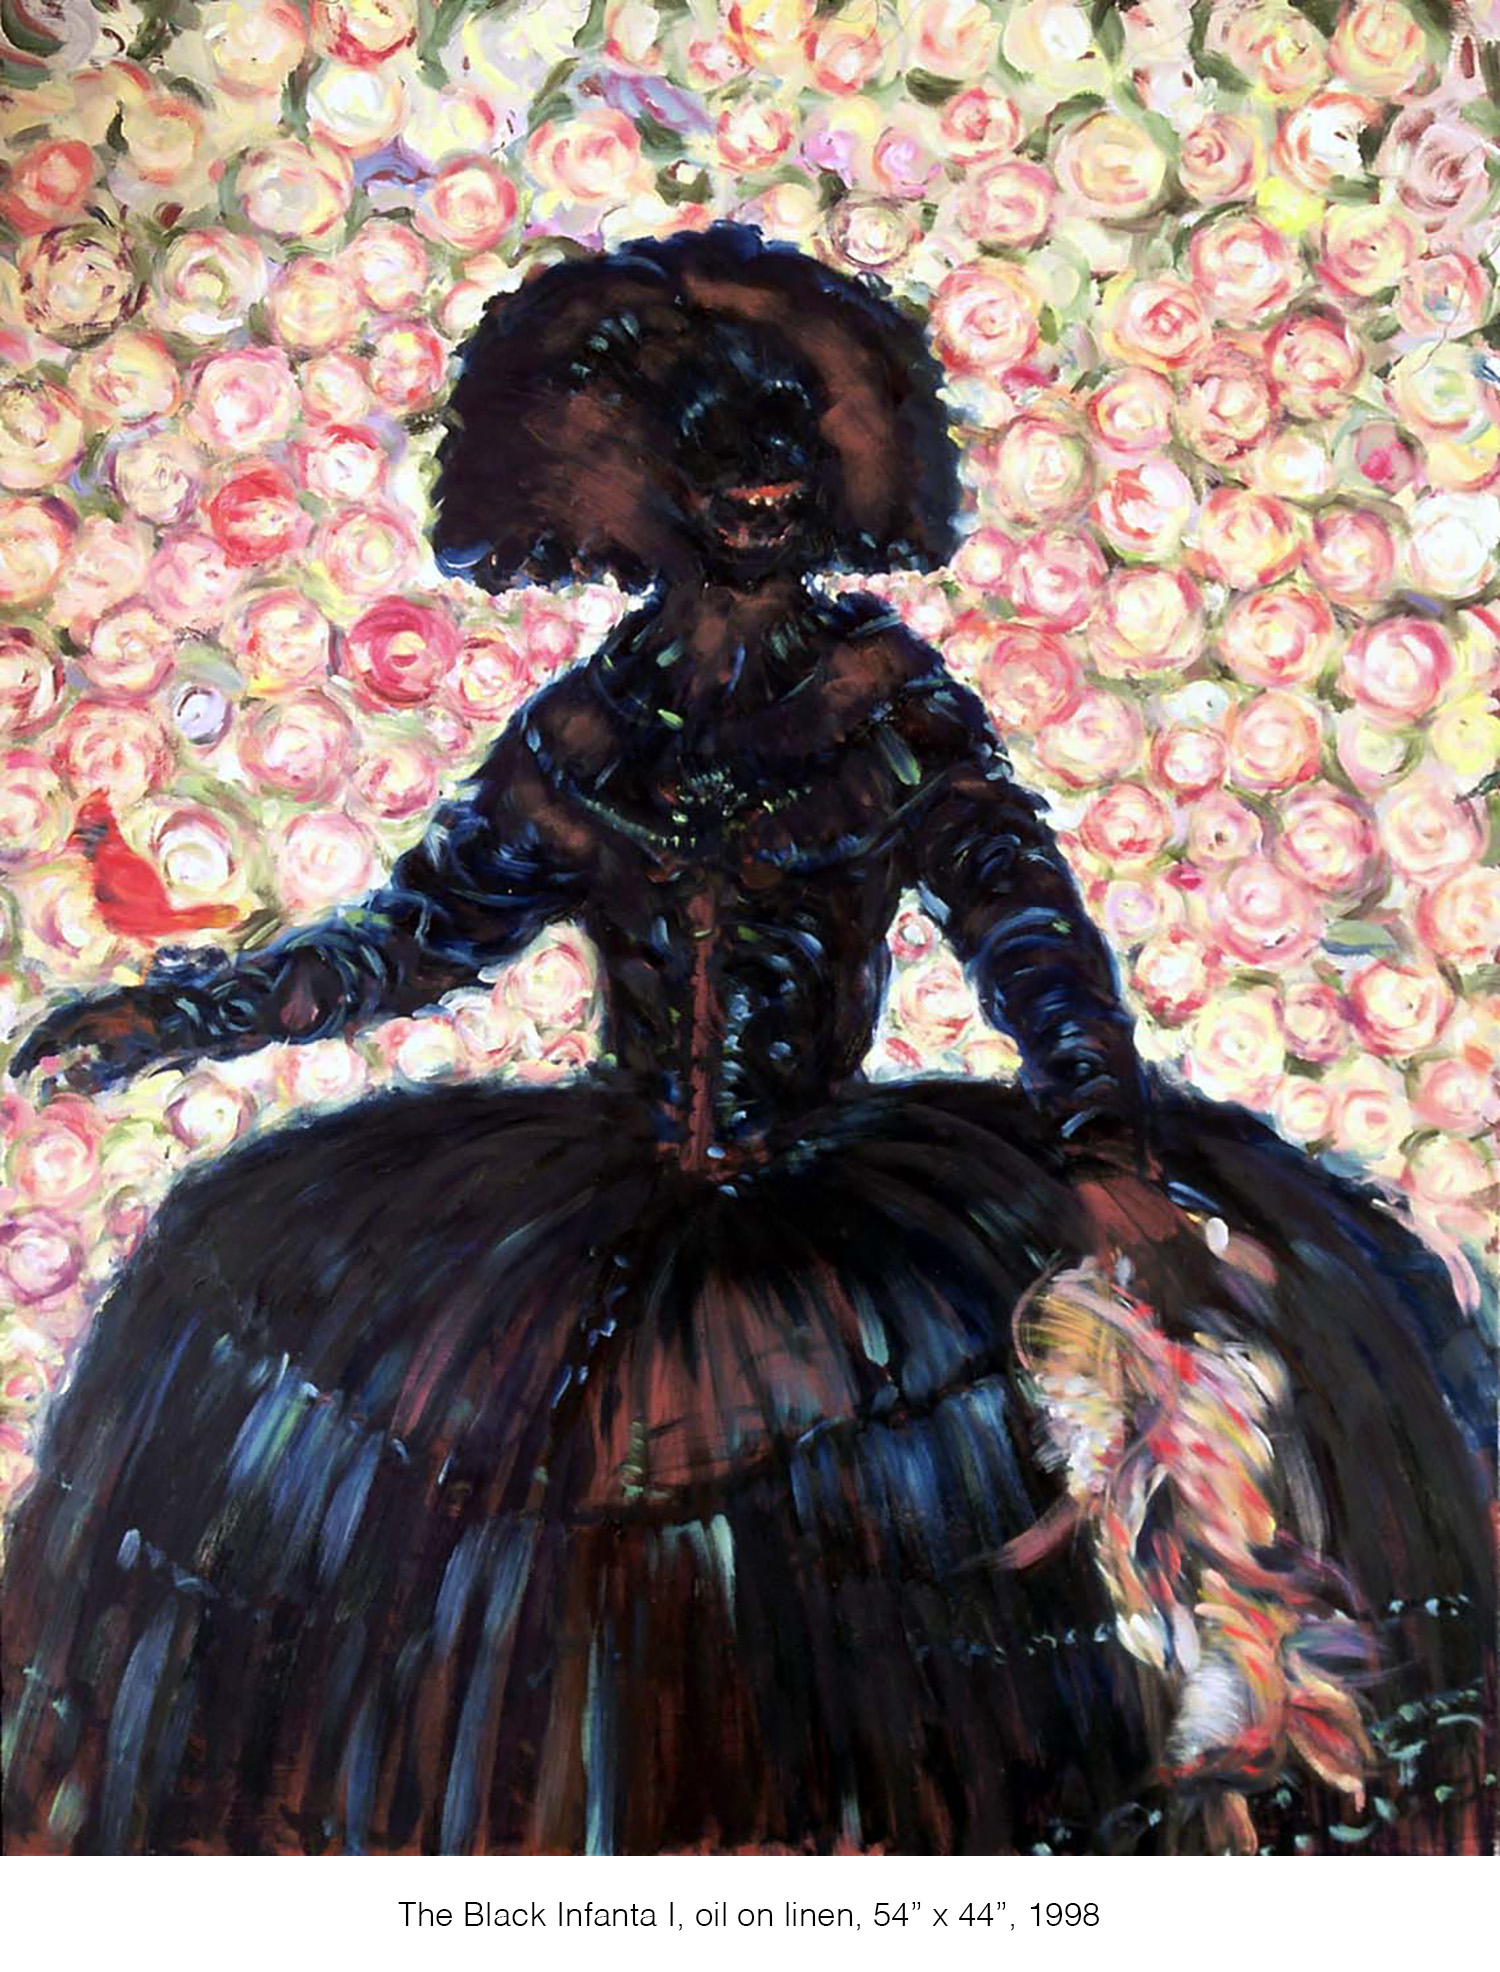 The Black Infanta I_1500.jpg